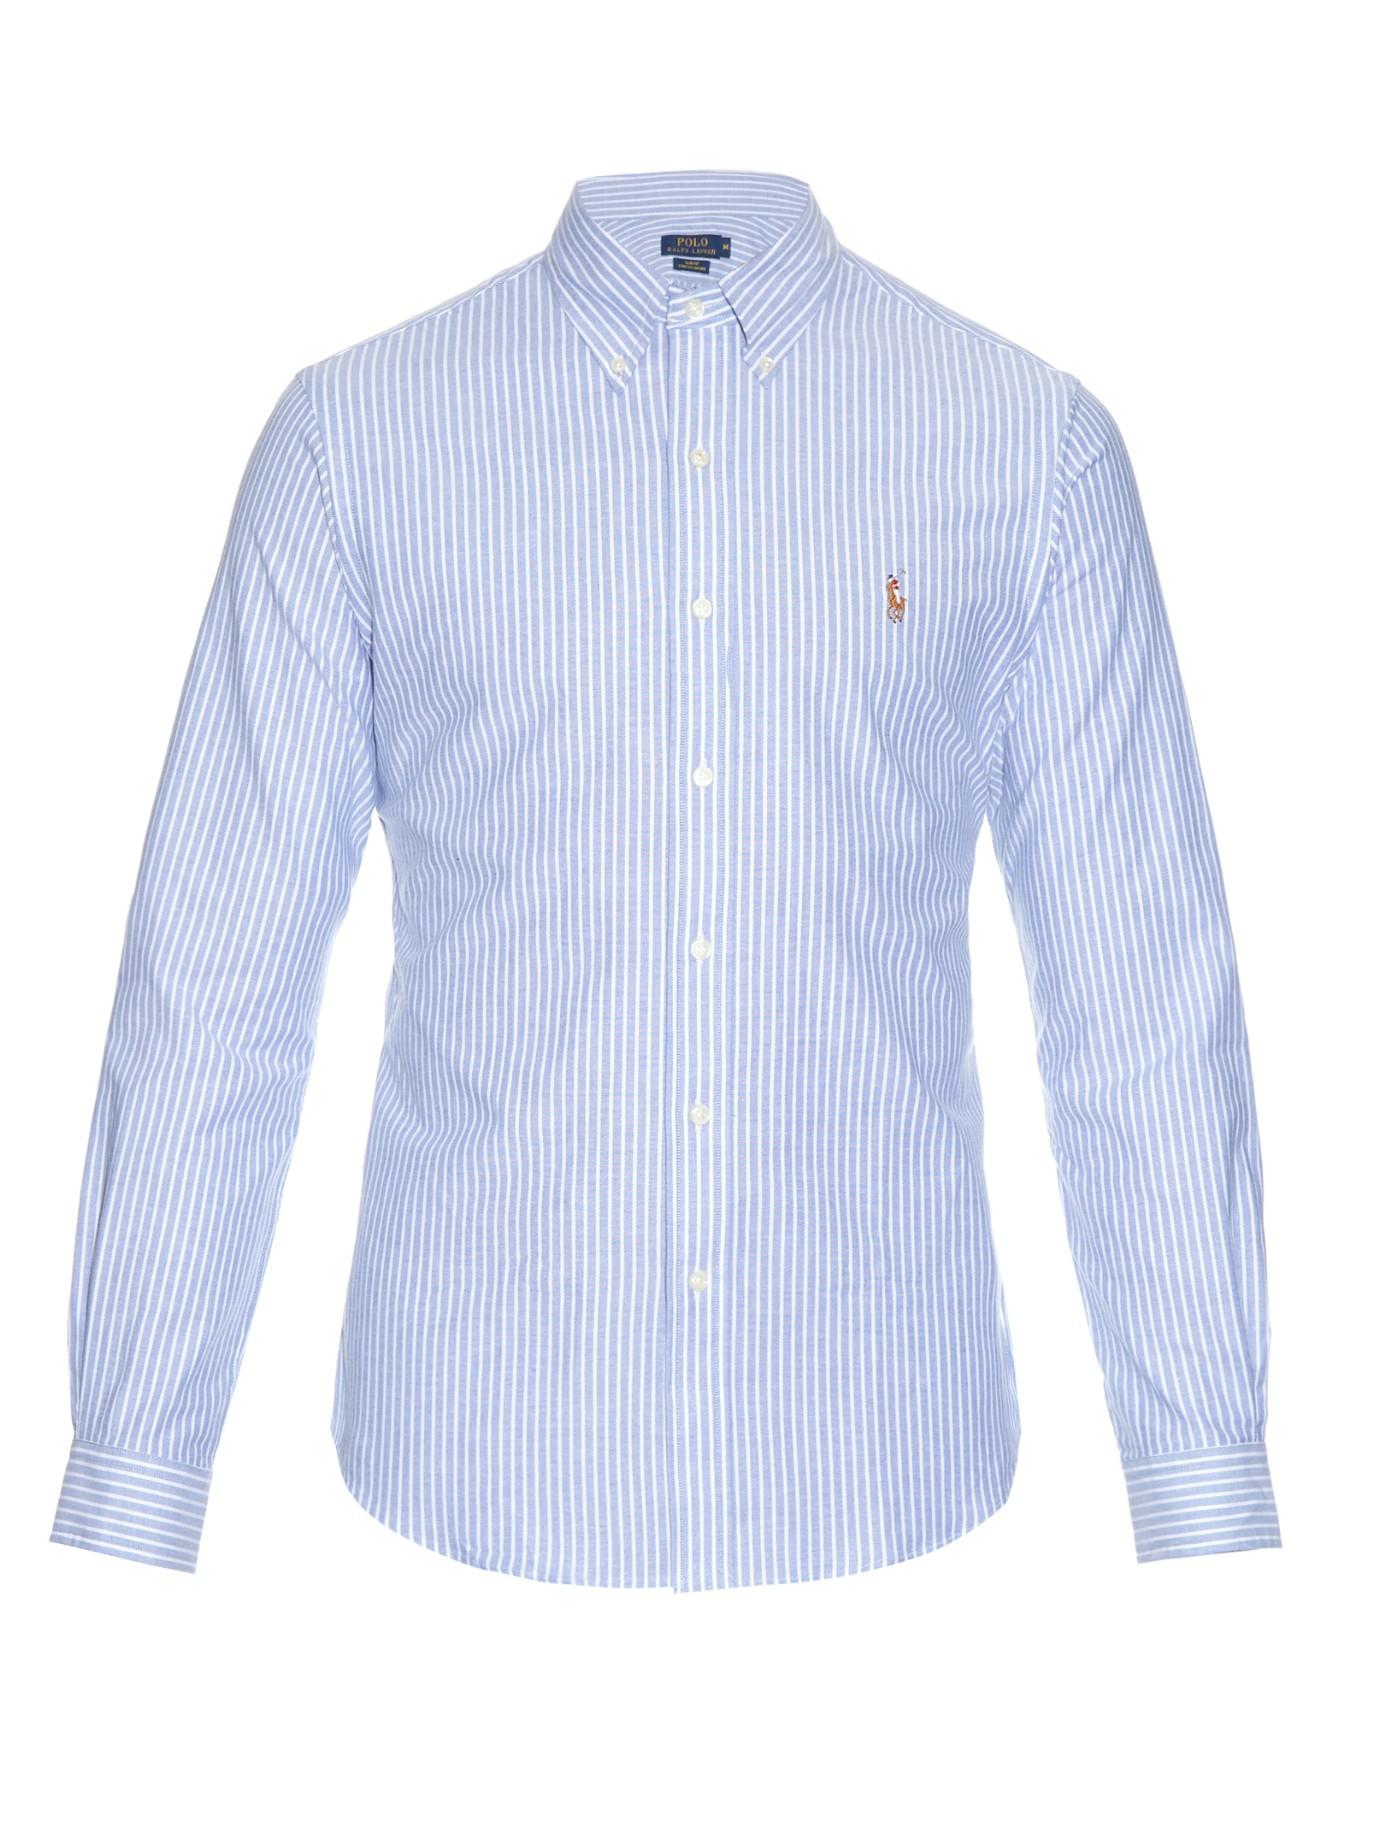 Polo Ralph Lauren Striped Cotton Oxford Blend Shirt In Blue For Men Lyst